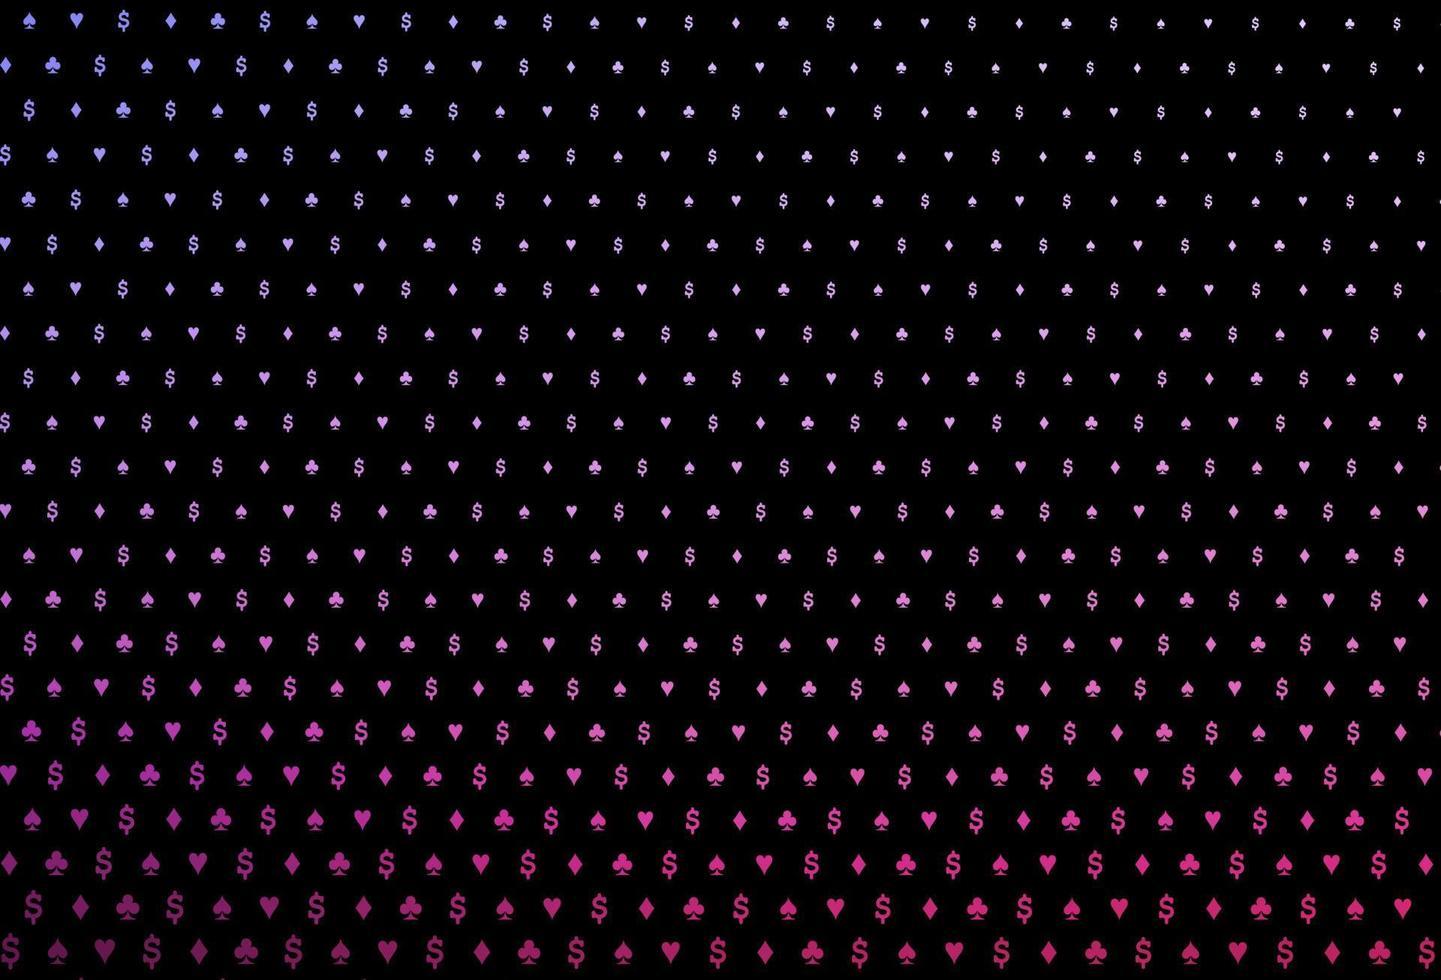 layout de vetor rosa escuro, azul com elementos de cartas.